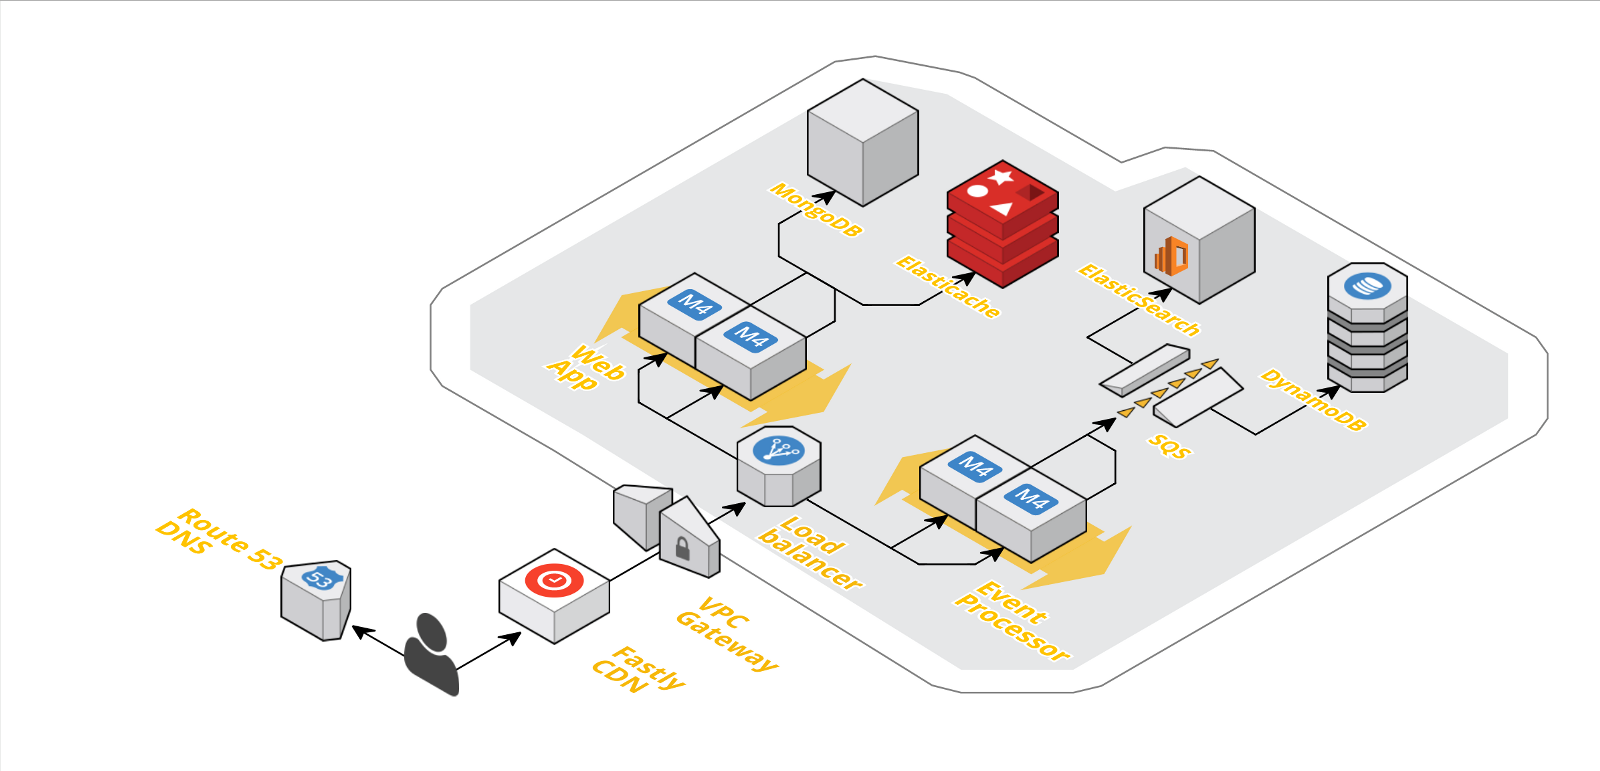 LaunchDarkly AWS architecture